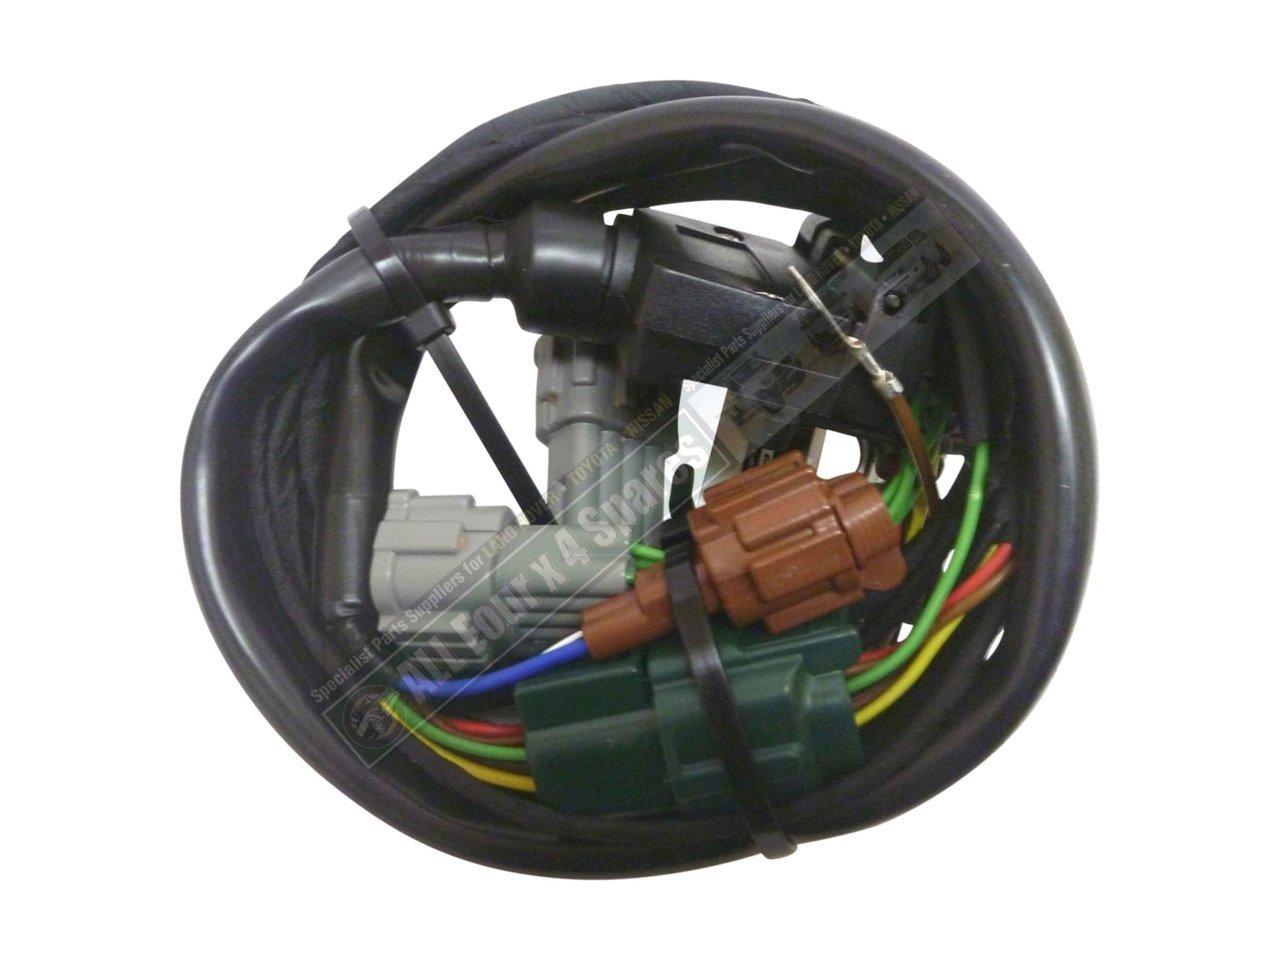 Nissan Patrol Tow Bar Wiring Harness : Milford towbar wiring harness nissan navara d on